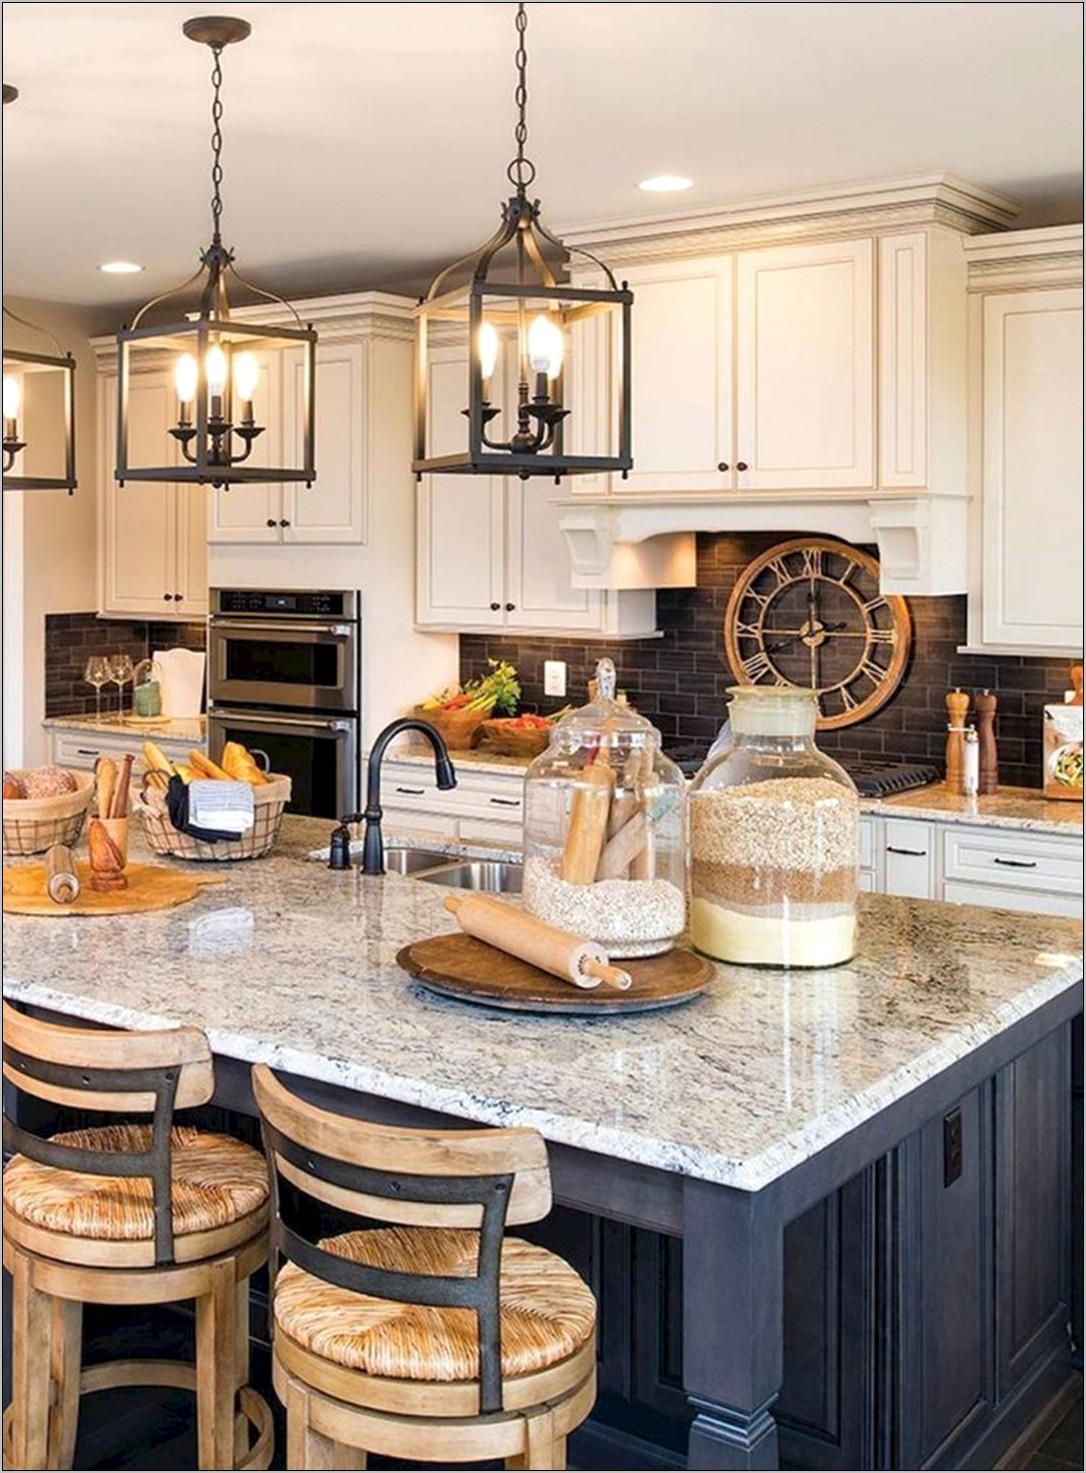 Whimsical Kitchen Decorating Ideas